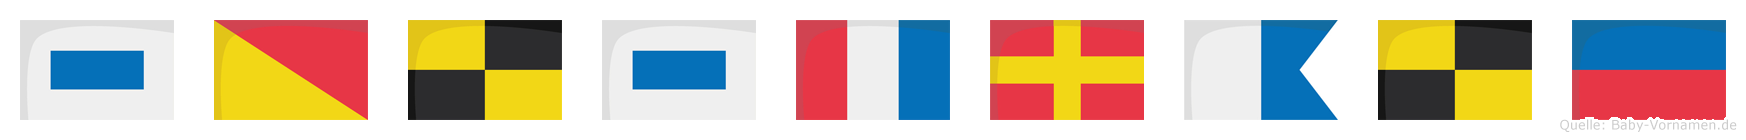 Solstrale im Flaggenalphabet